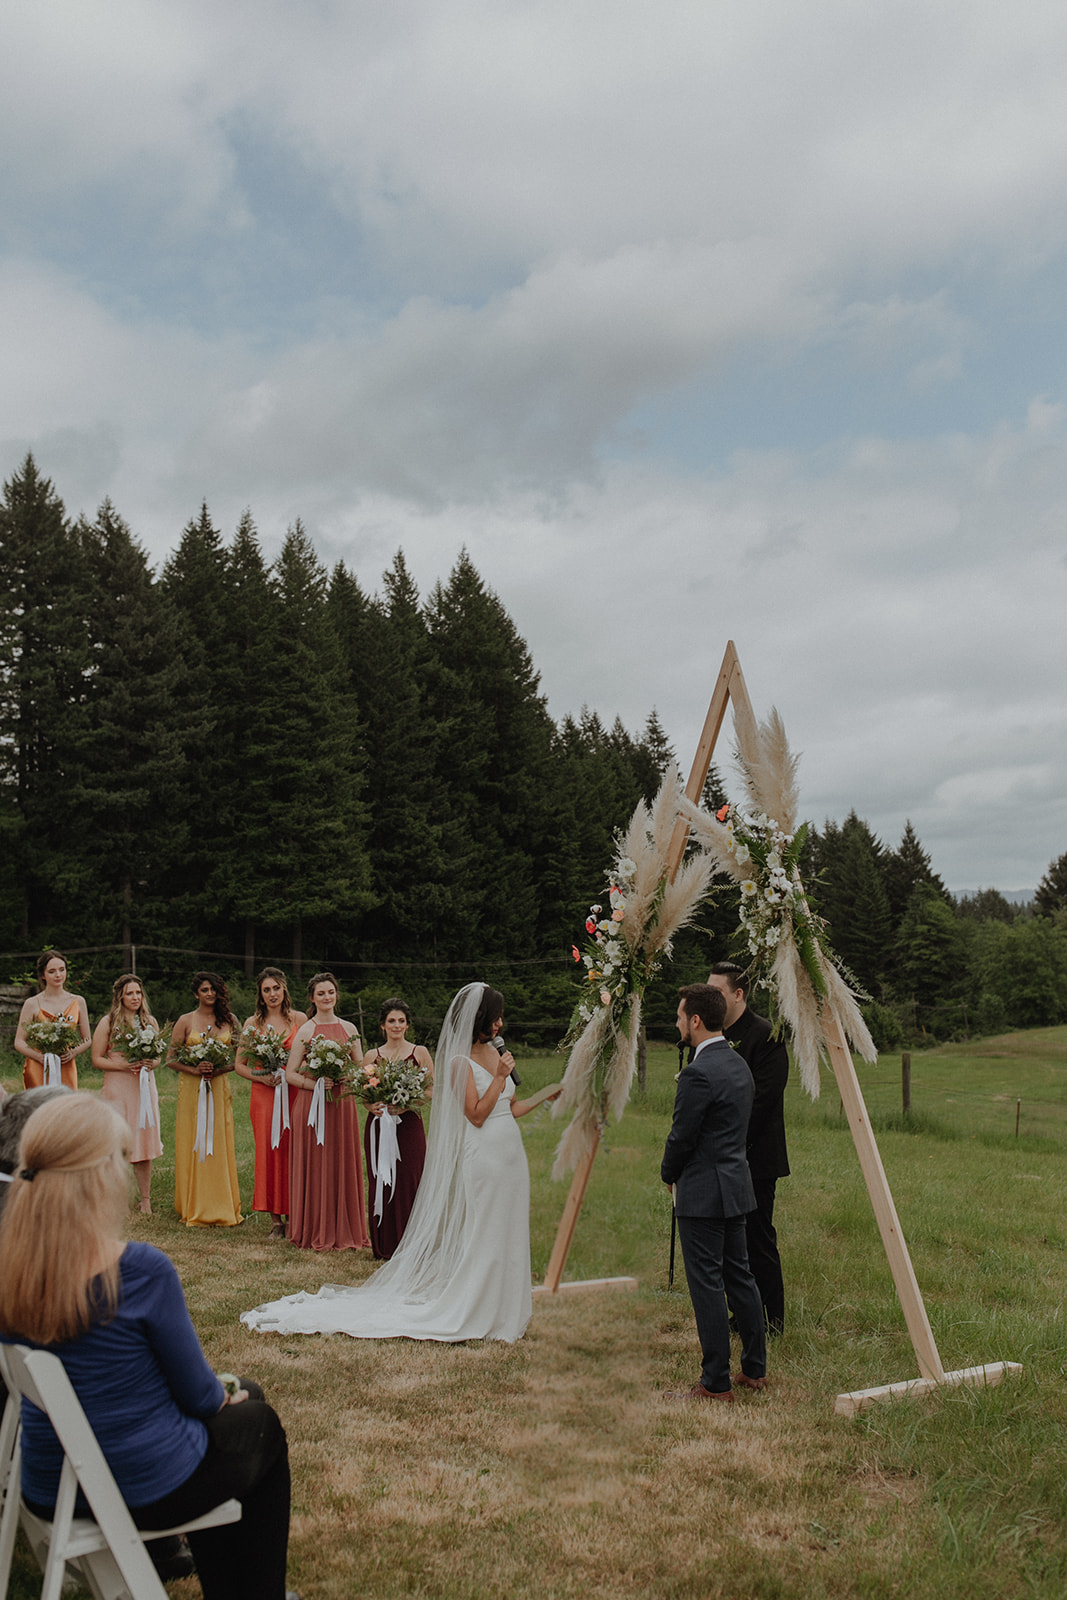 cortney_skye_wedding_june2019-398.jpg